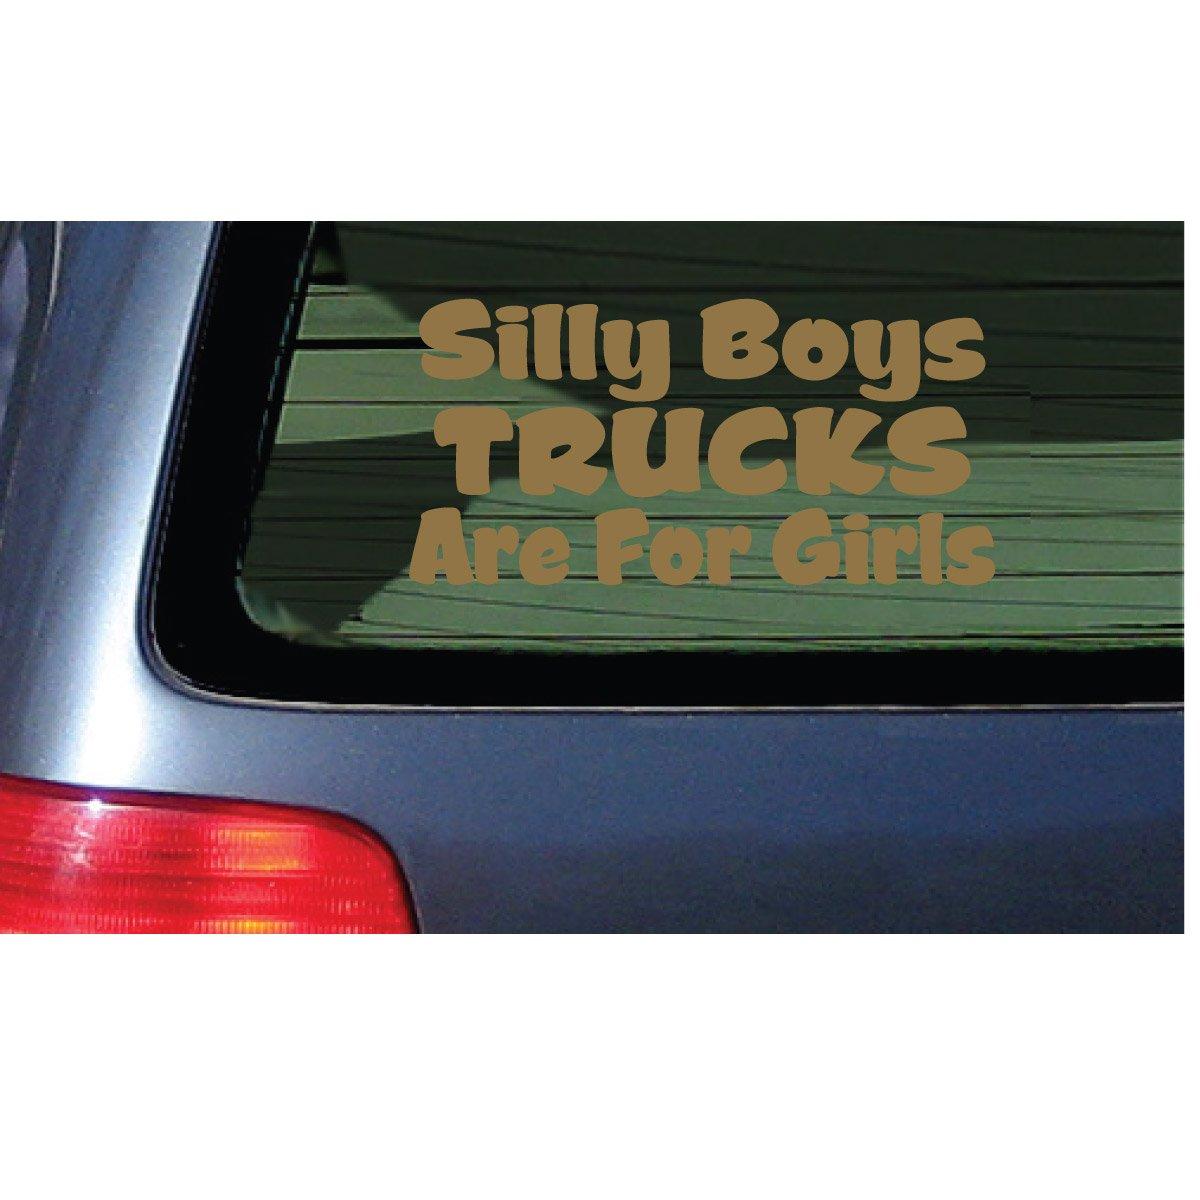 Amazon com silly boys trucks are for girls vinyl decal pink window sticker automotive